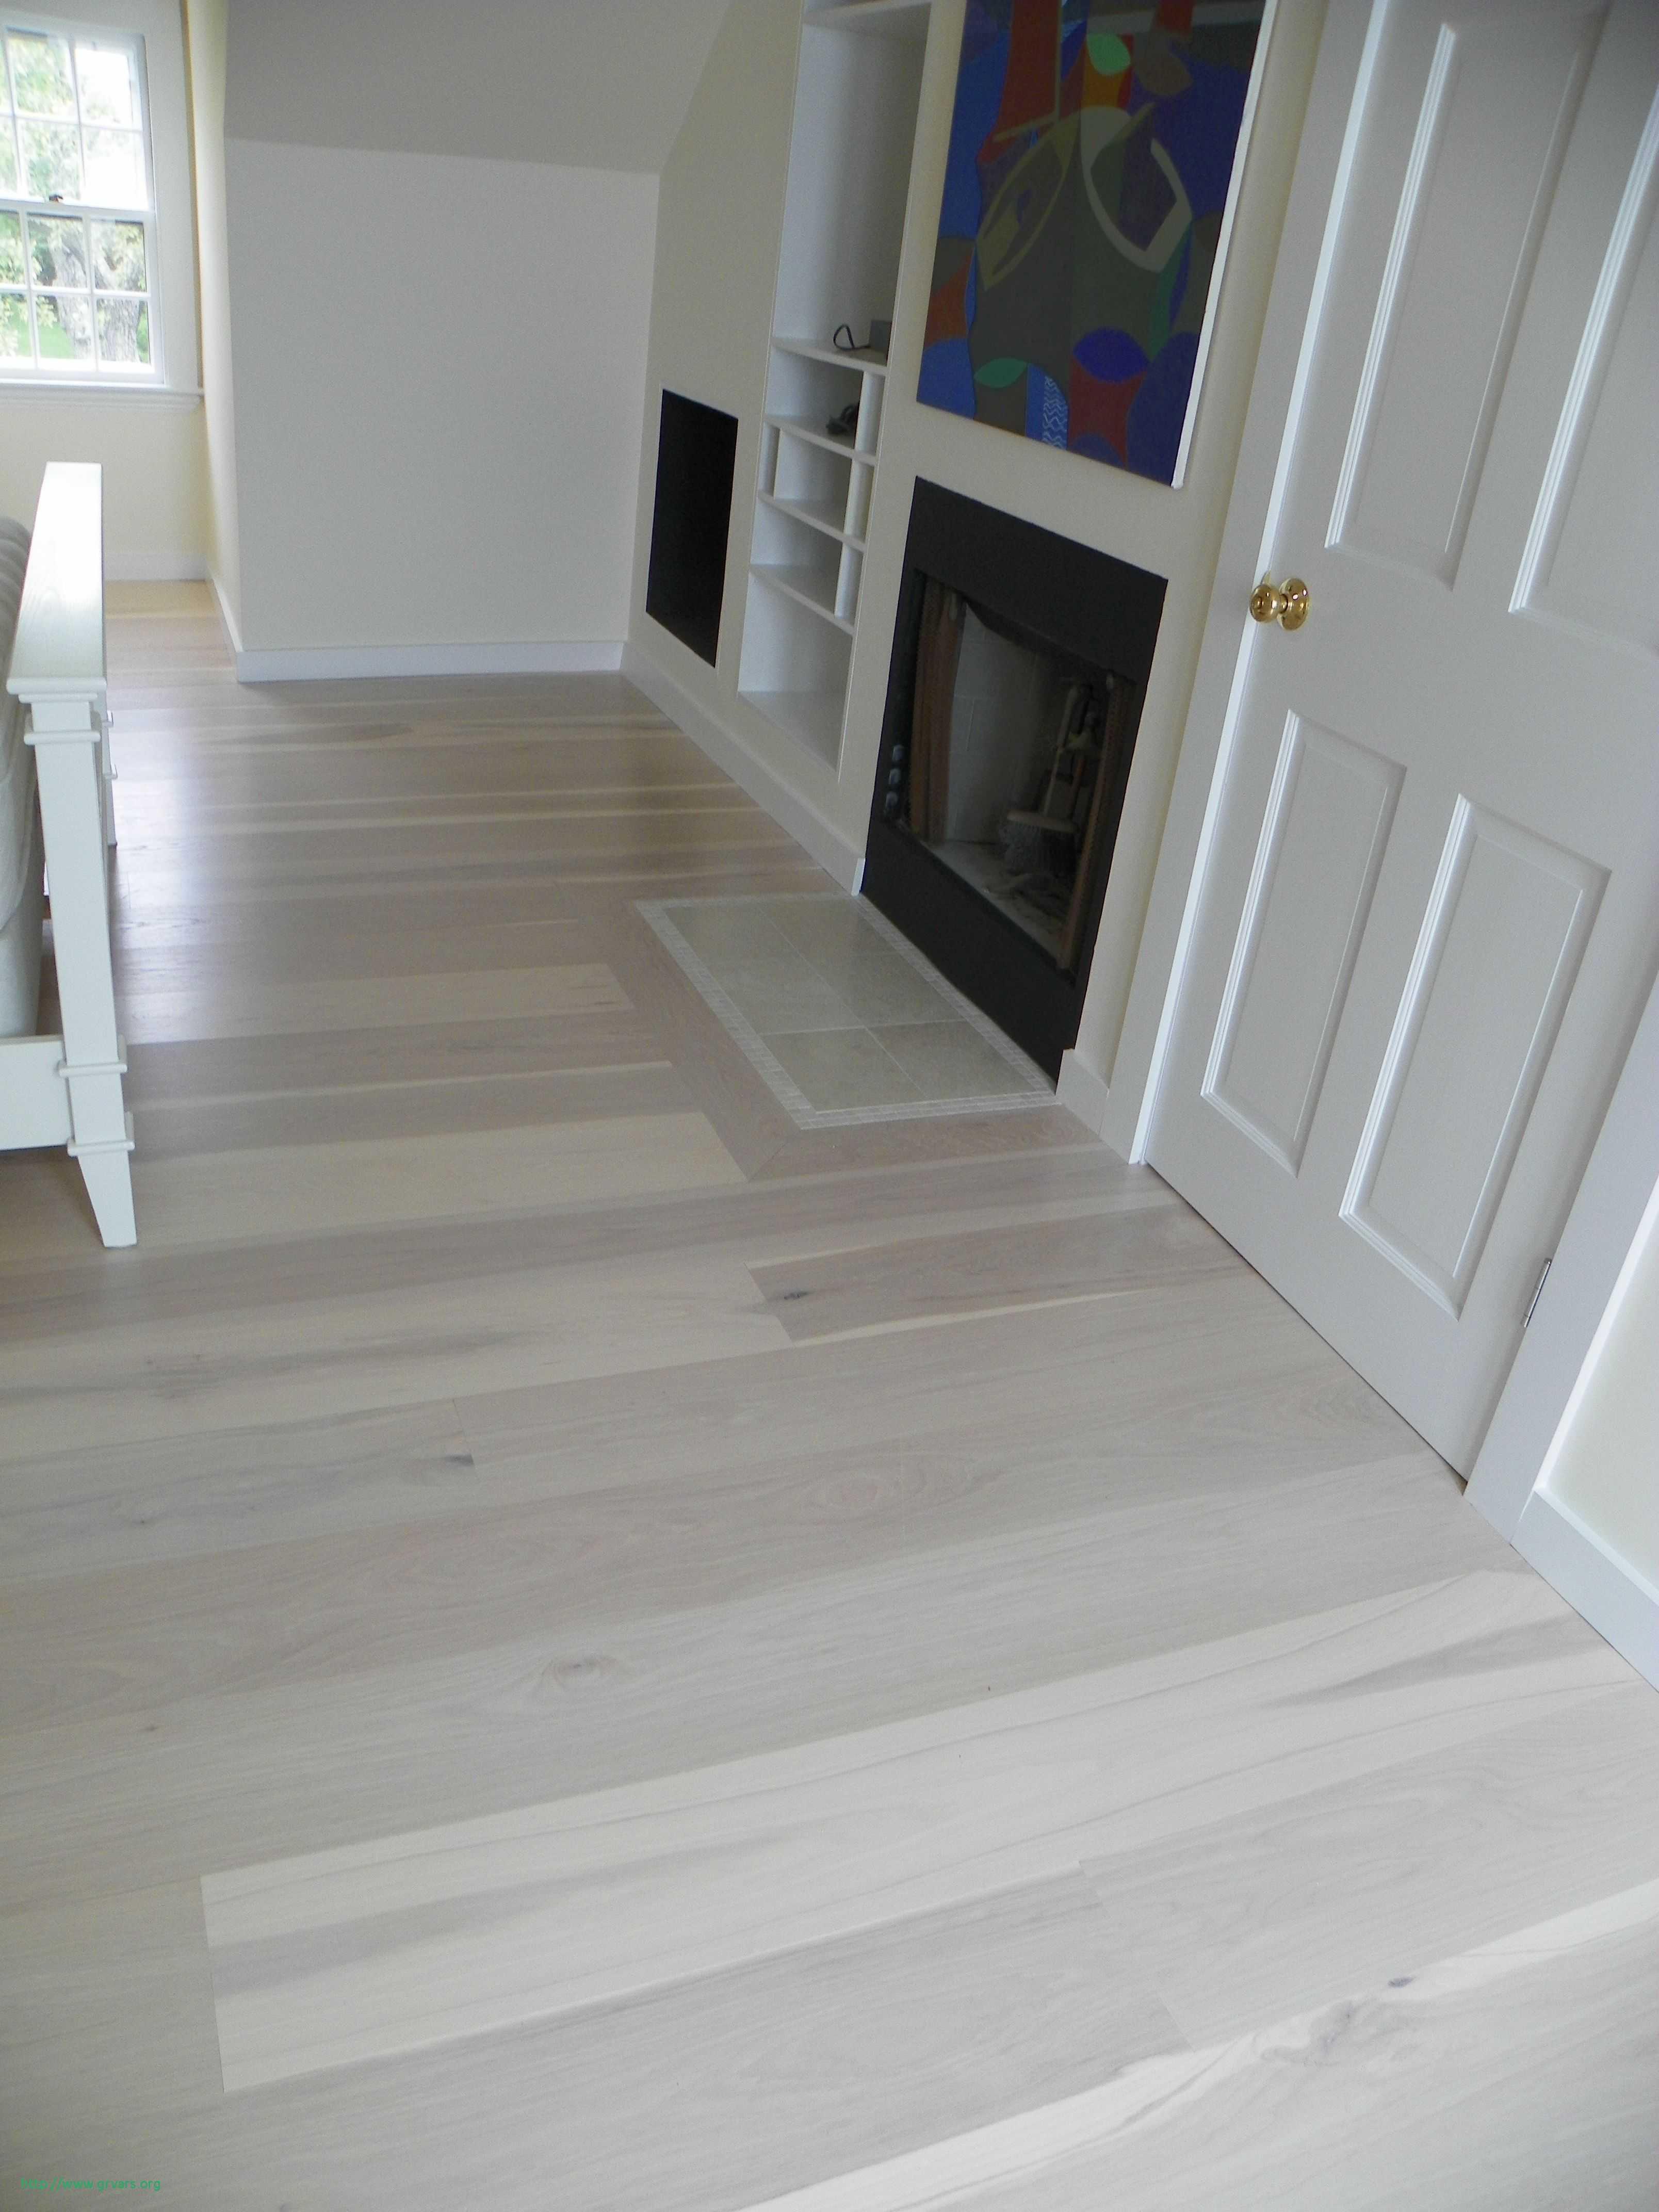 tropical walnut hardwood flooring of 21 luxe how to clean prefinished hardwood floors with vinegar regarding blog wood floors pine flooring